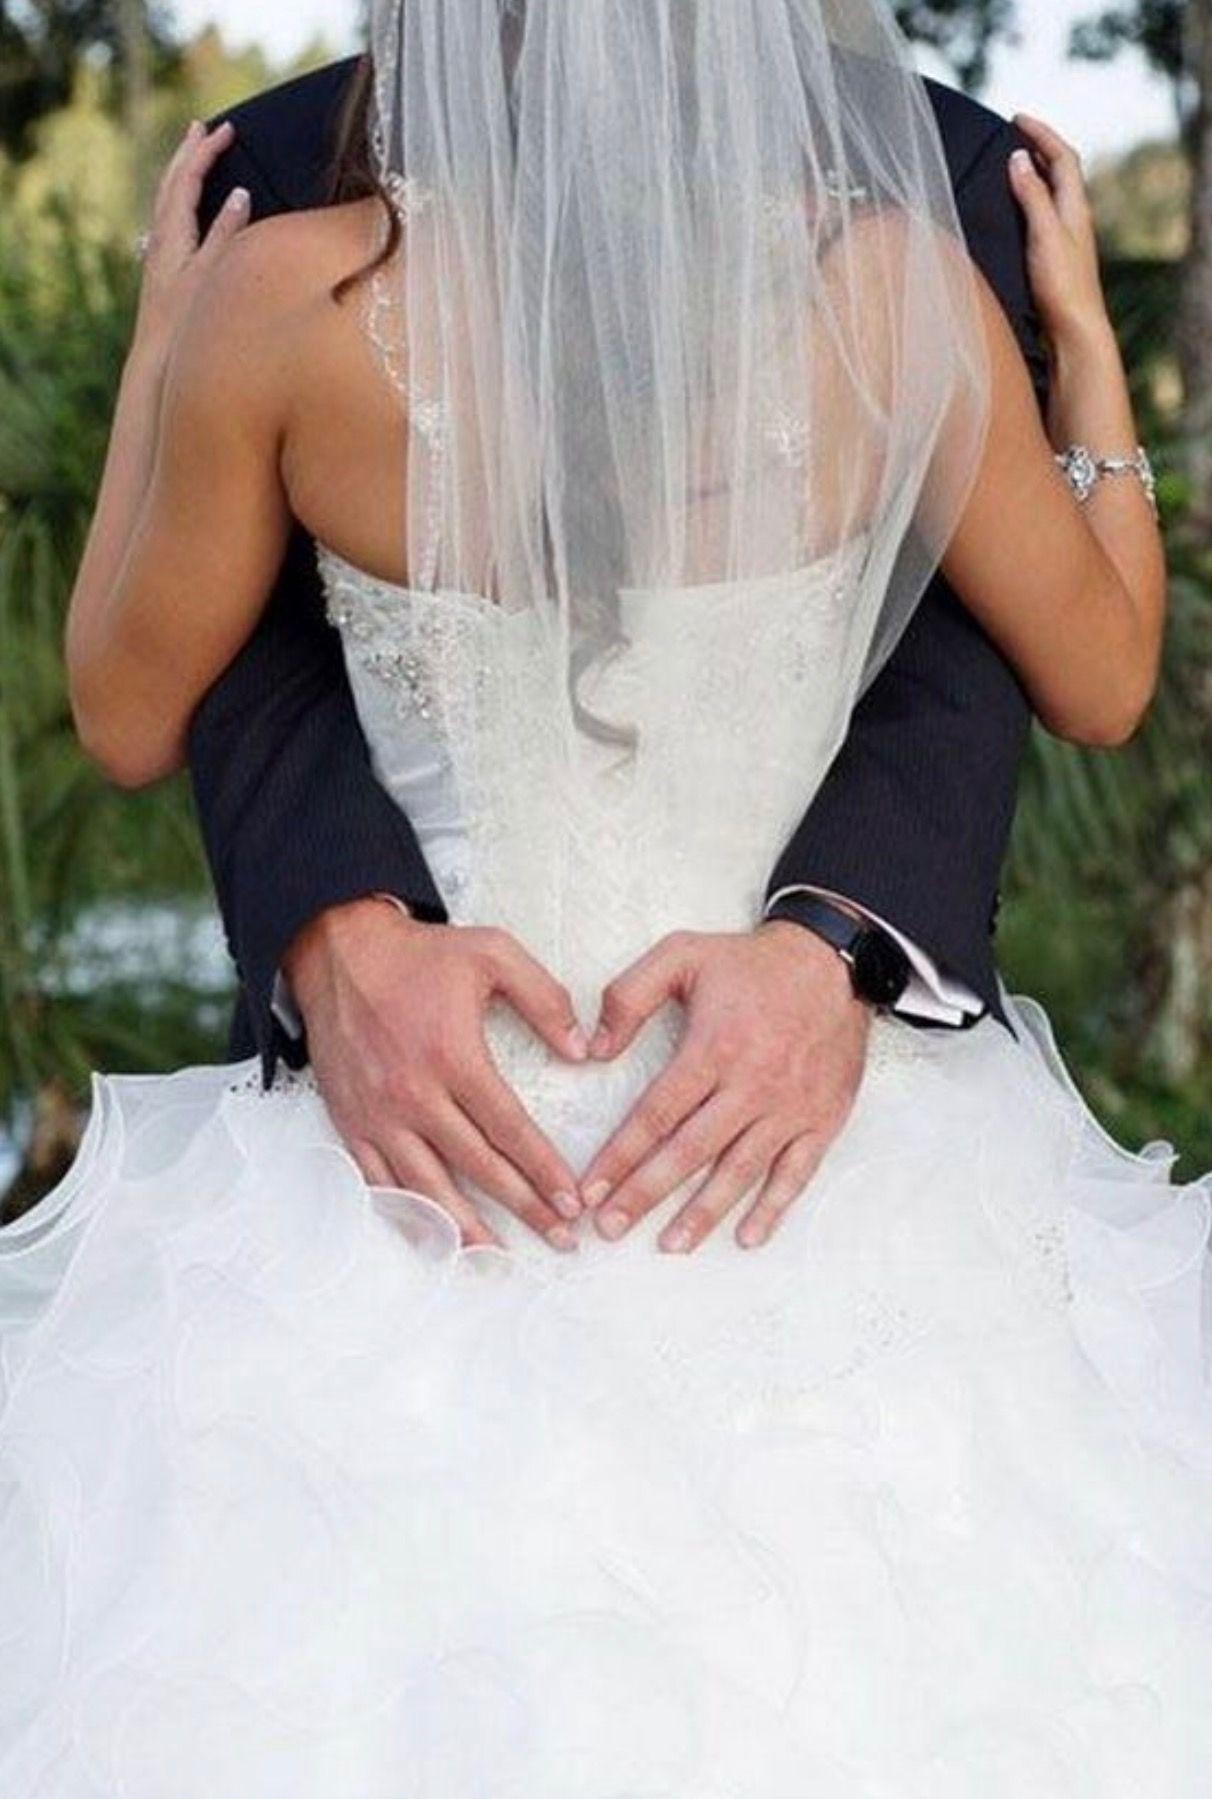 Pin by Victoria Brasili on My Wedding Day   Bridal